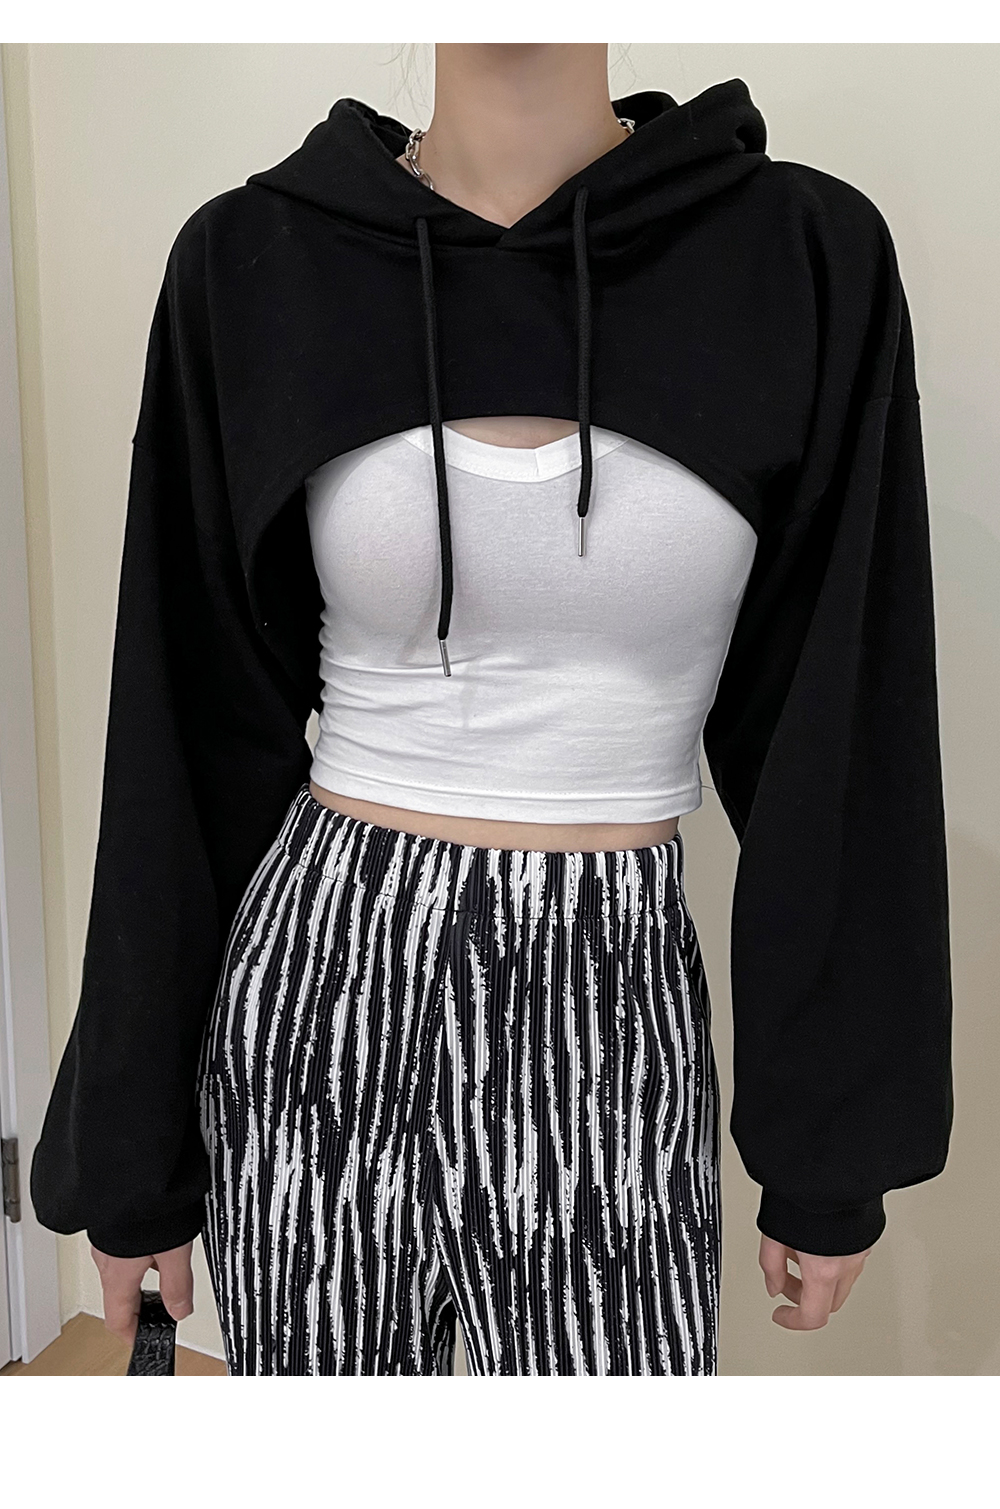 Lined bolero cropped hoodie